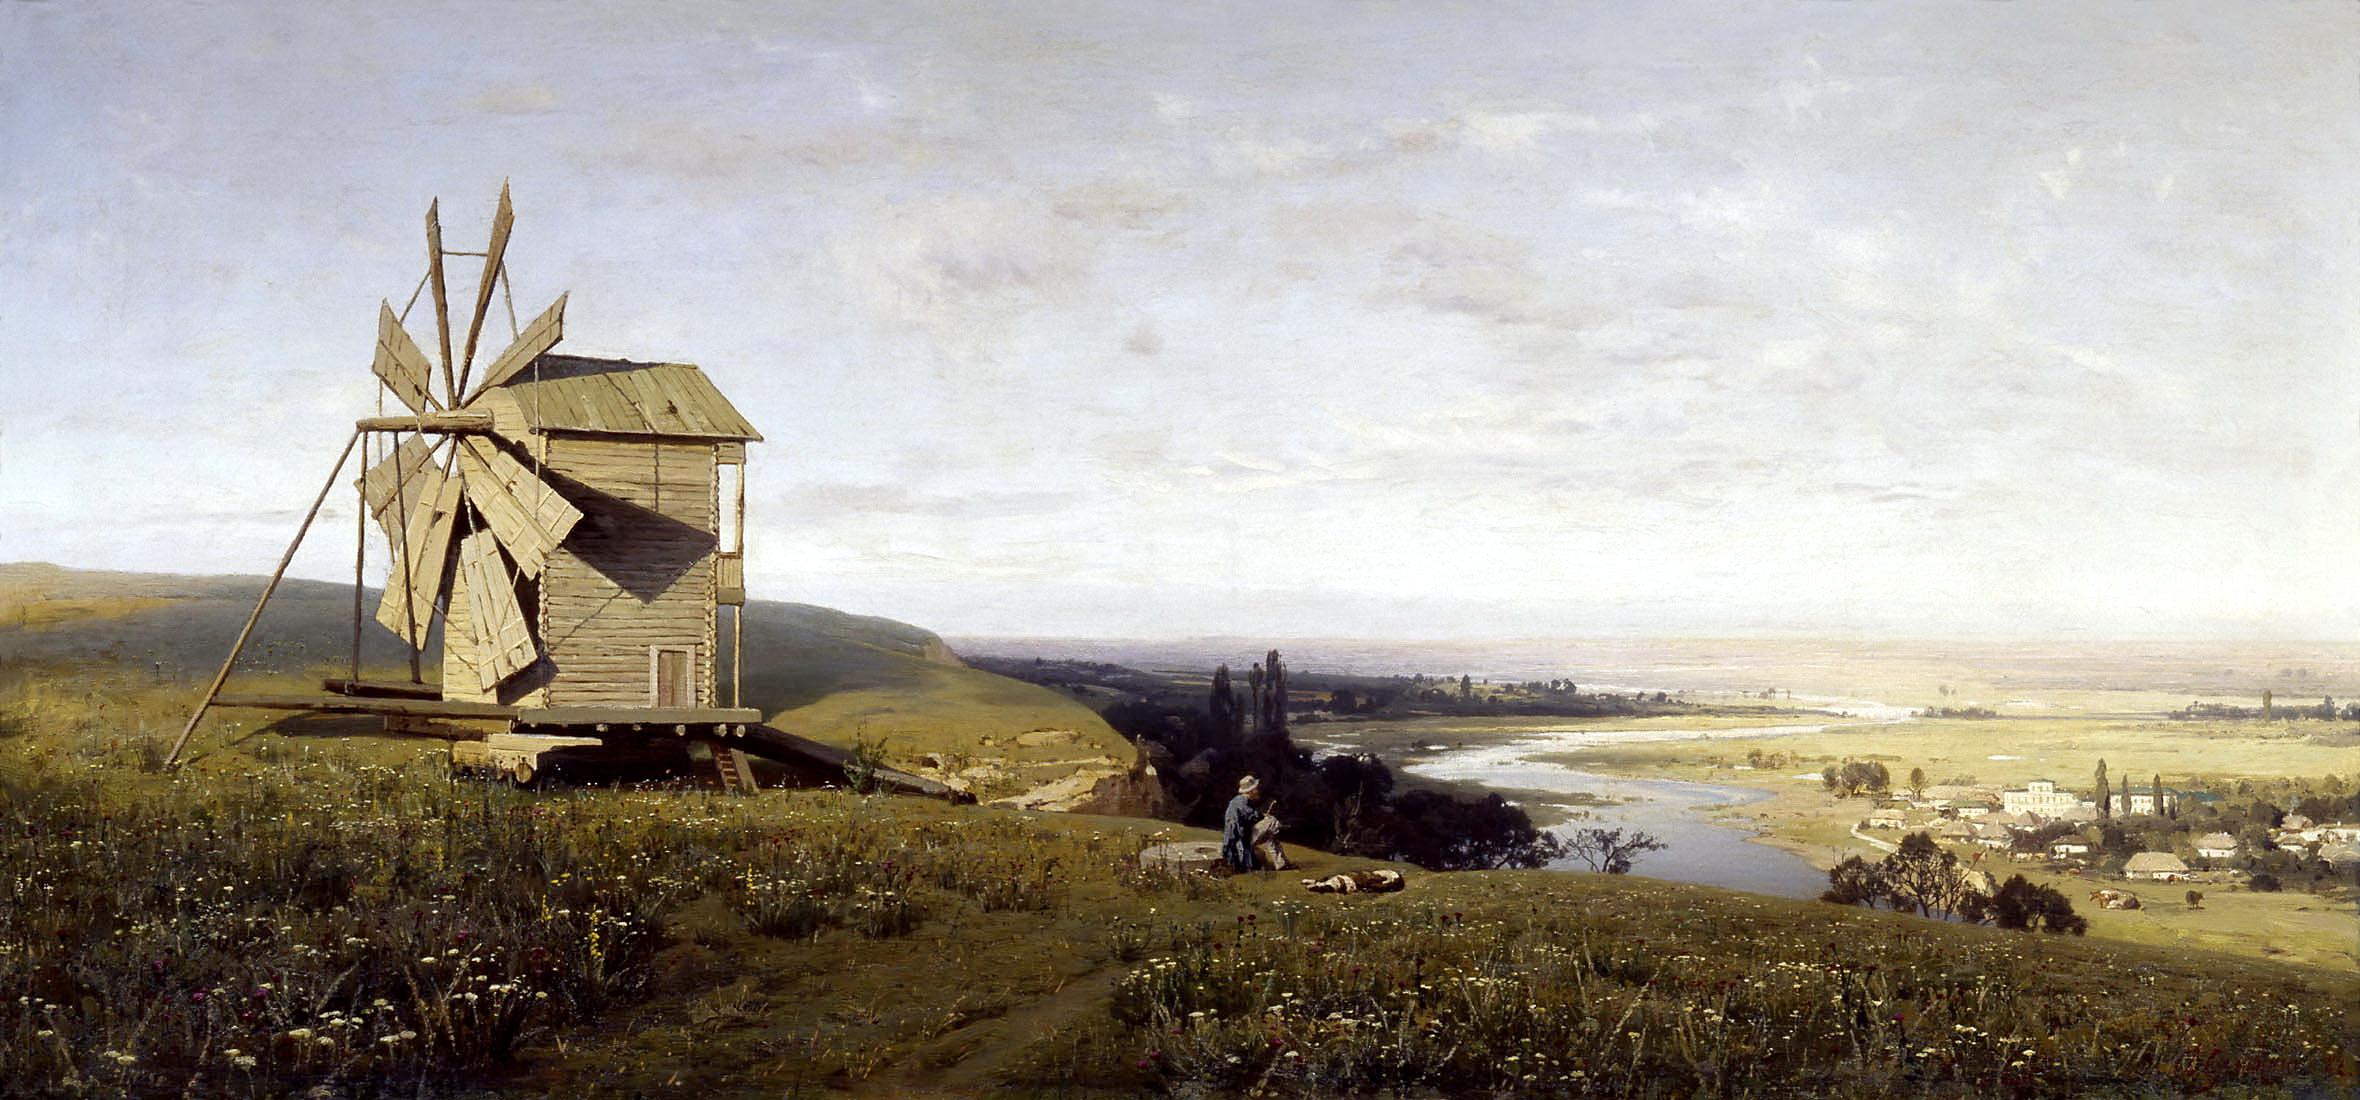 1385139487-orlovskiiy-vladimir---ukrainskiiy-peiyzazh-ukranian-paysage